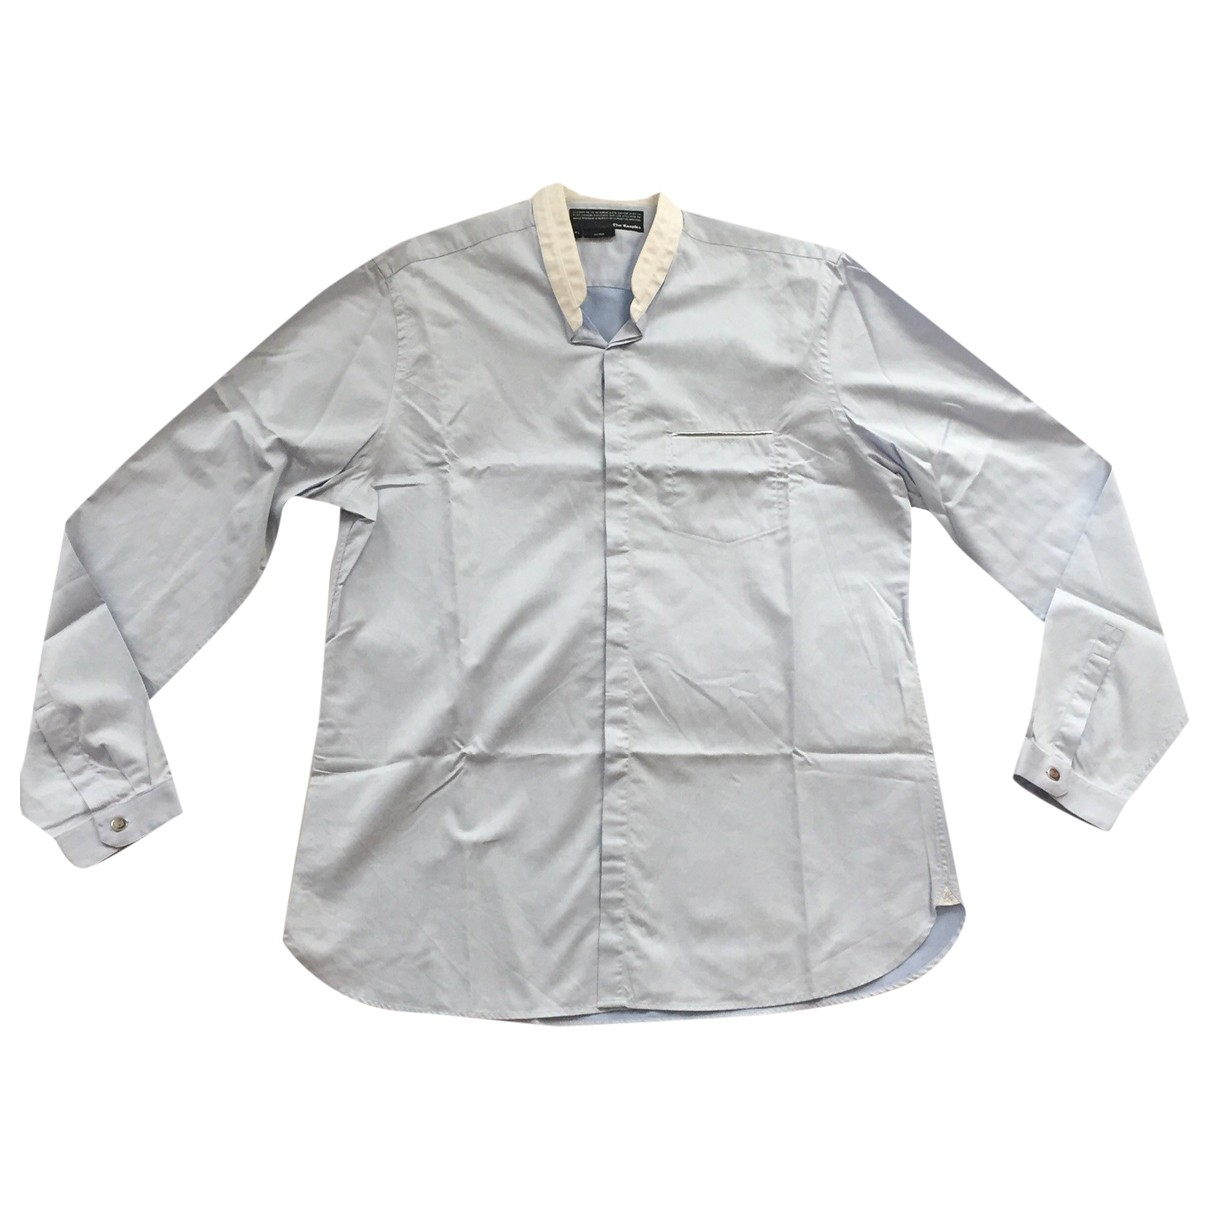 Camisas The Kooples